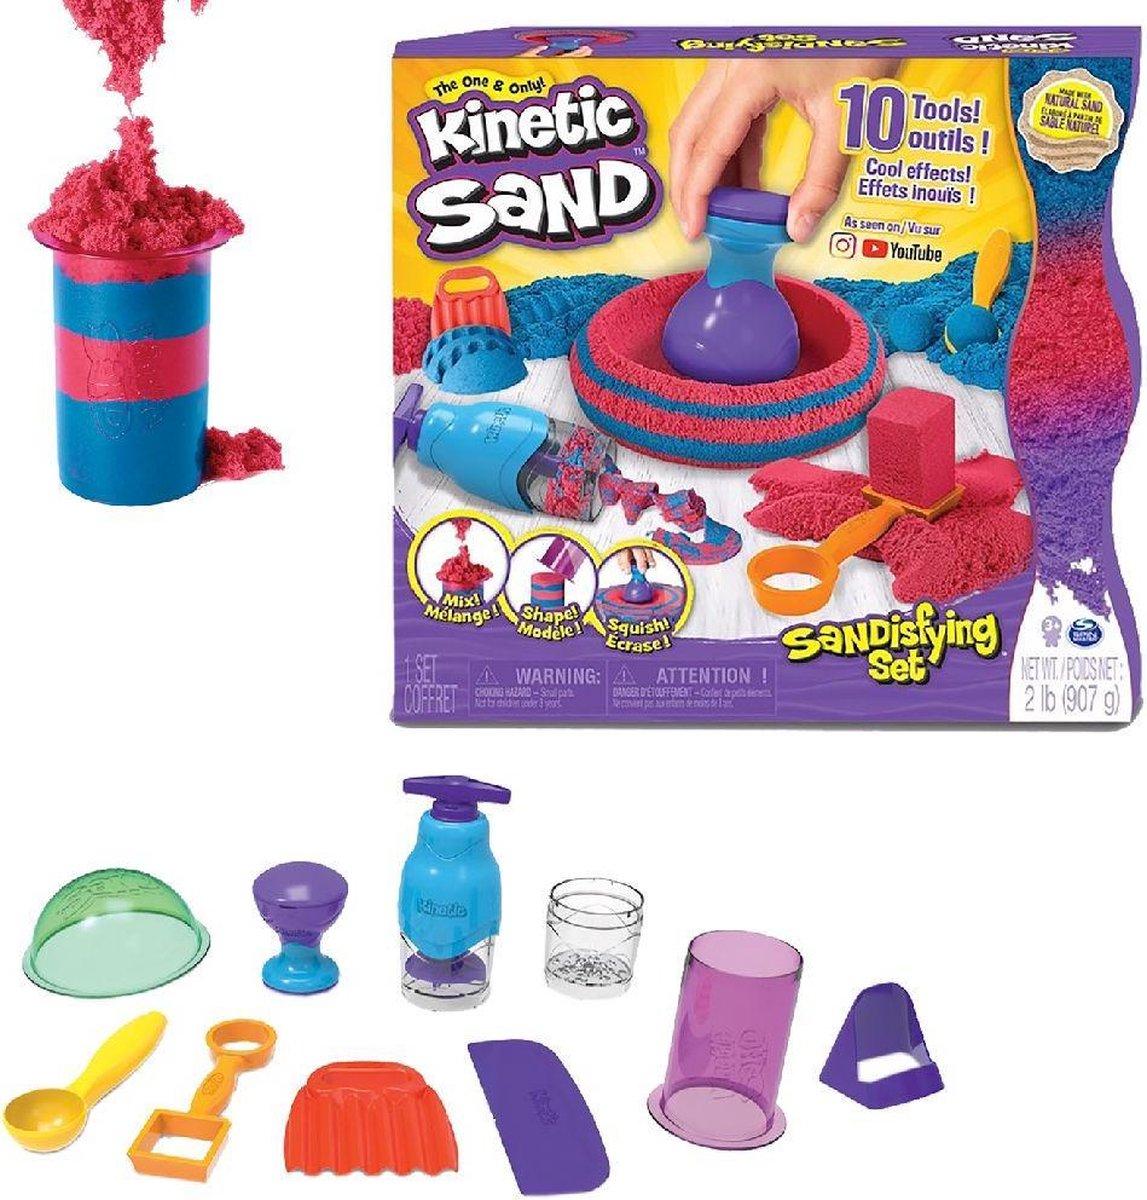 Kinetic Sand Sandisfying Set 907gr